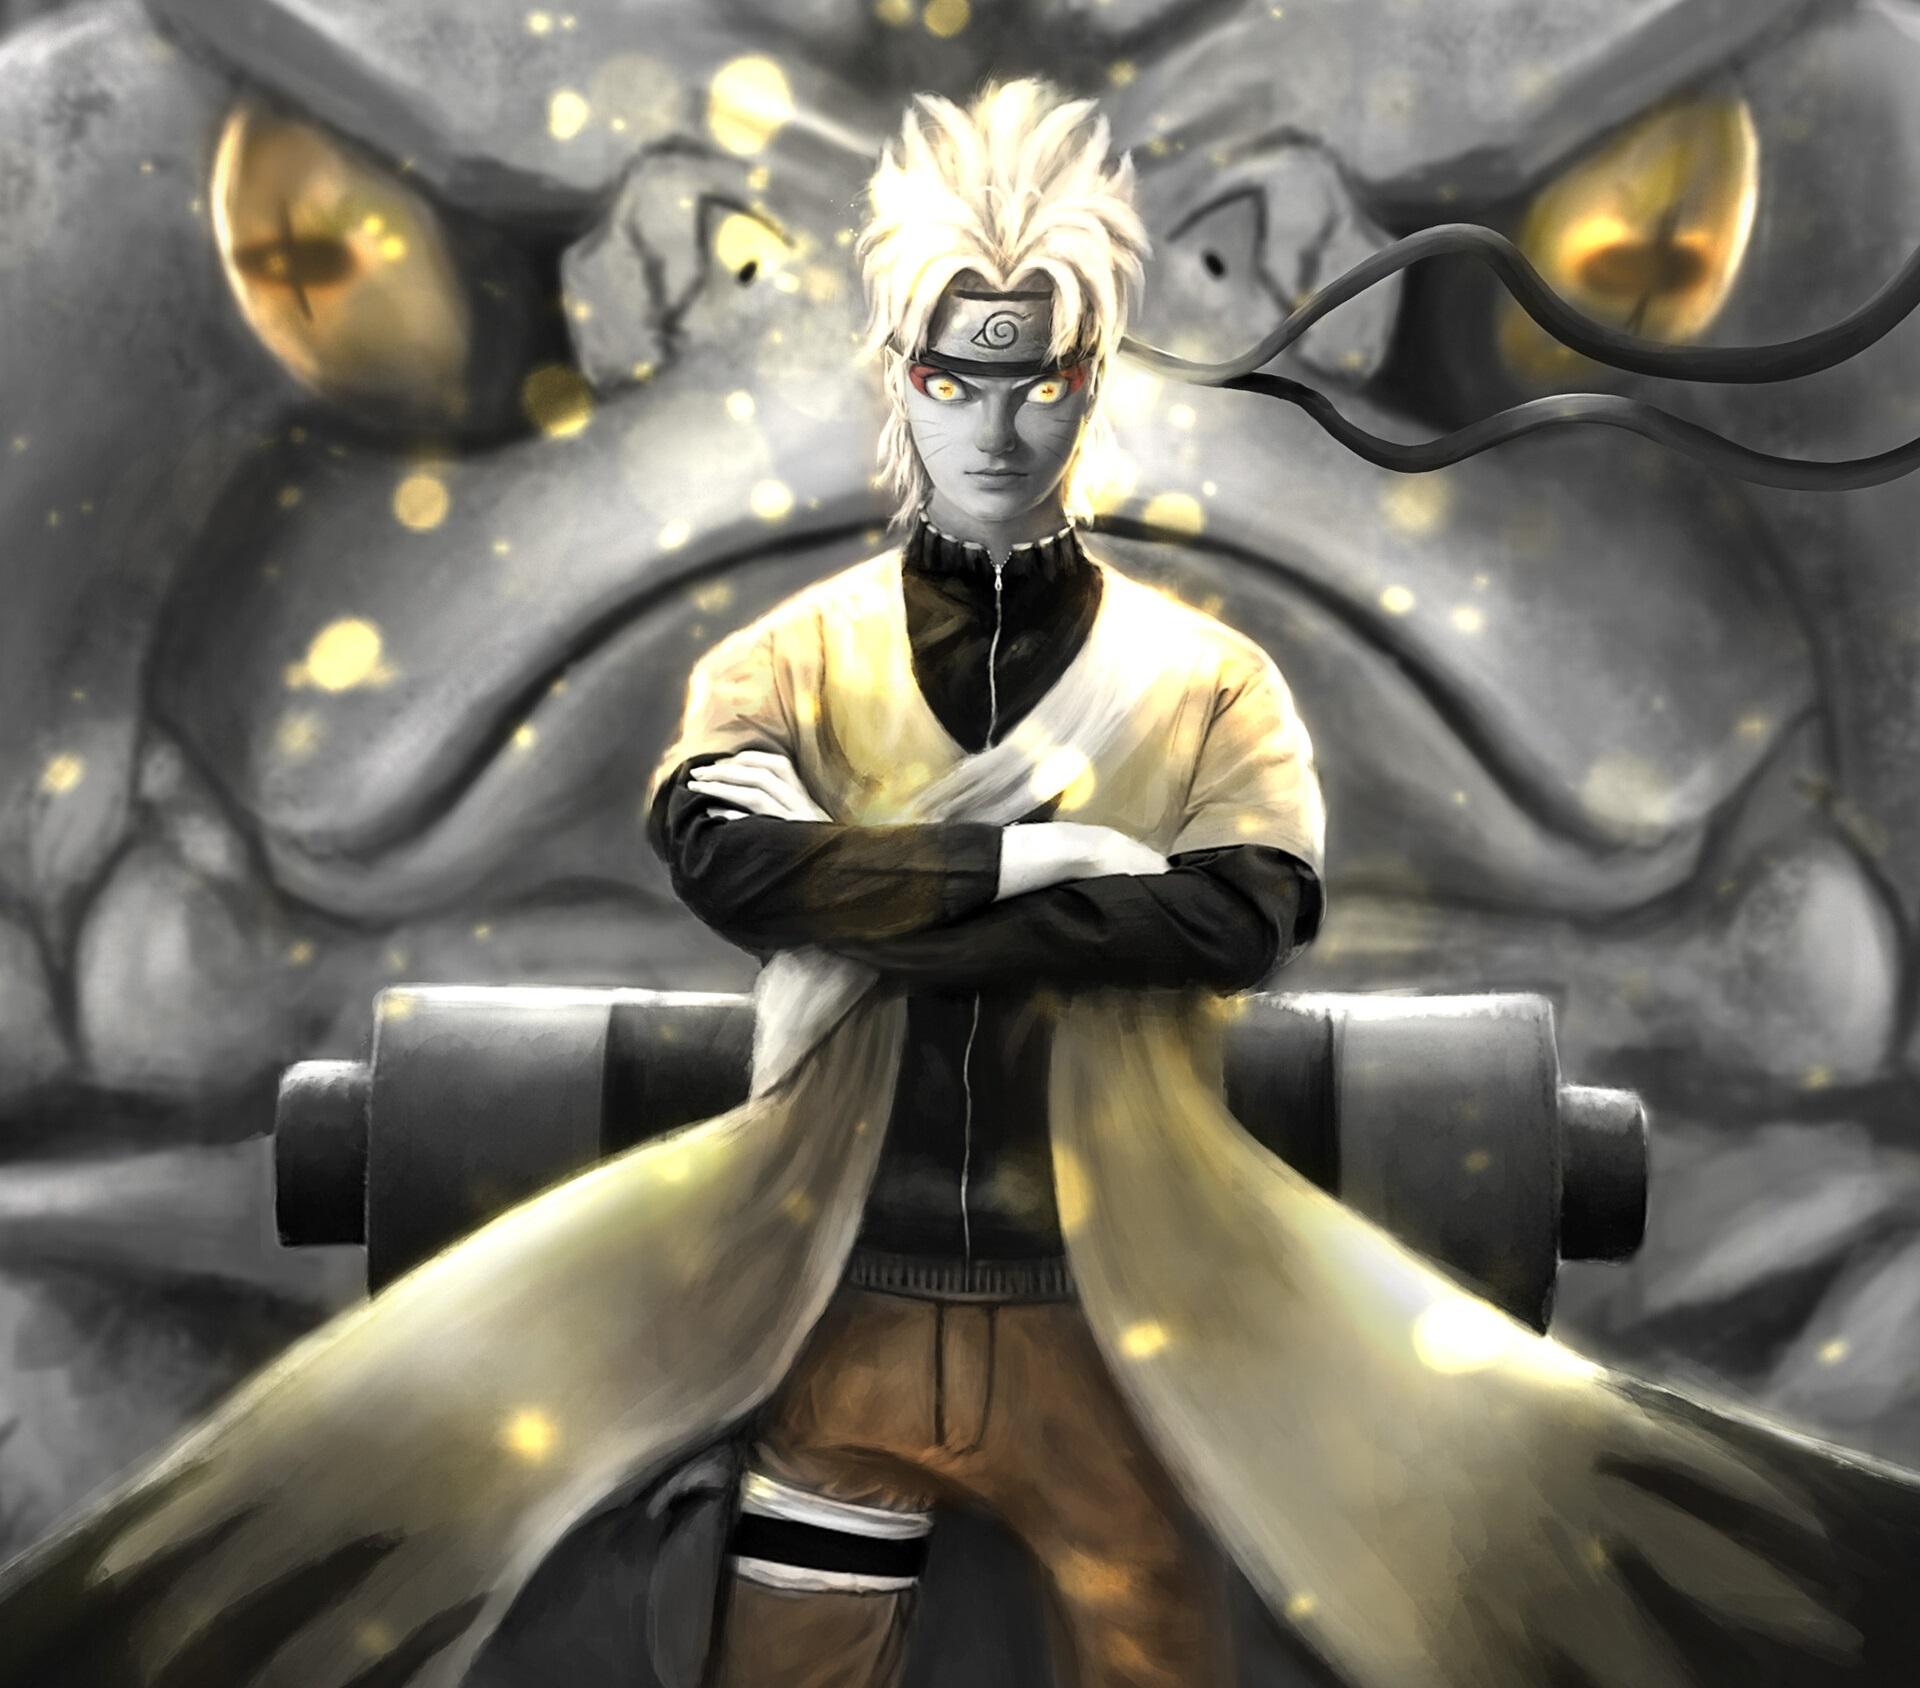 1920x1080 Naruto Uzumaki Orange Eyes 1080P Laptop Full HD ...